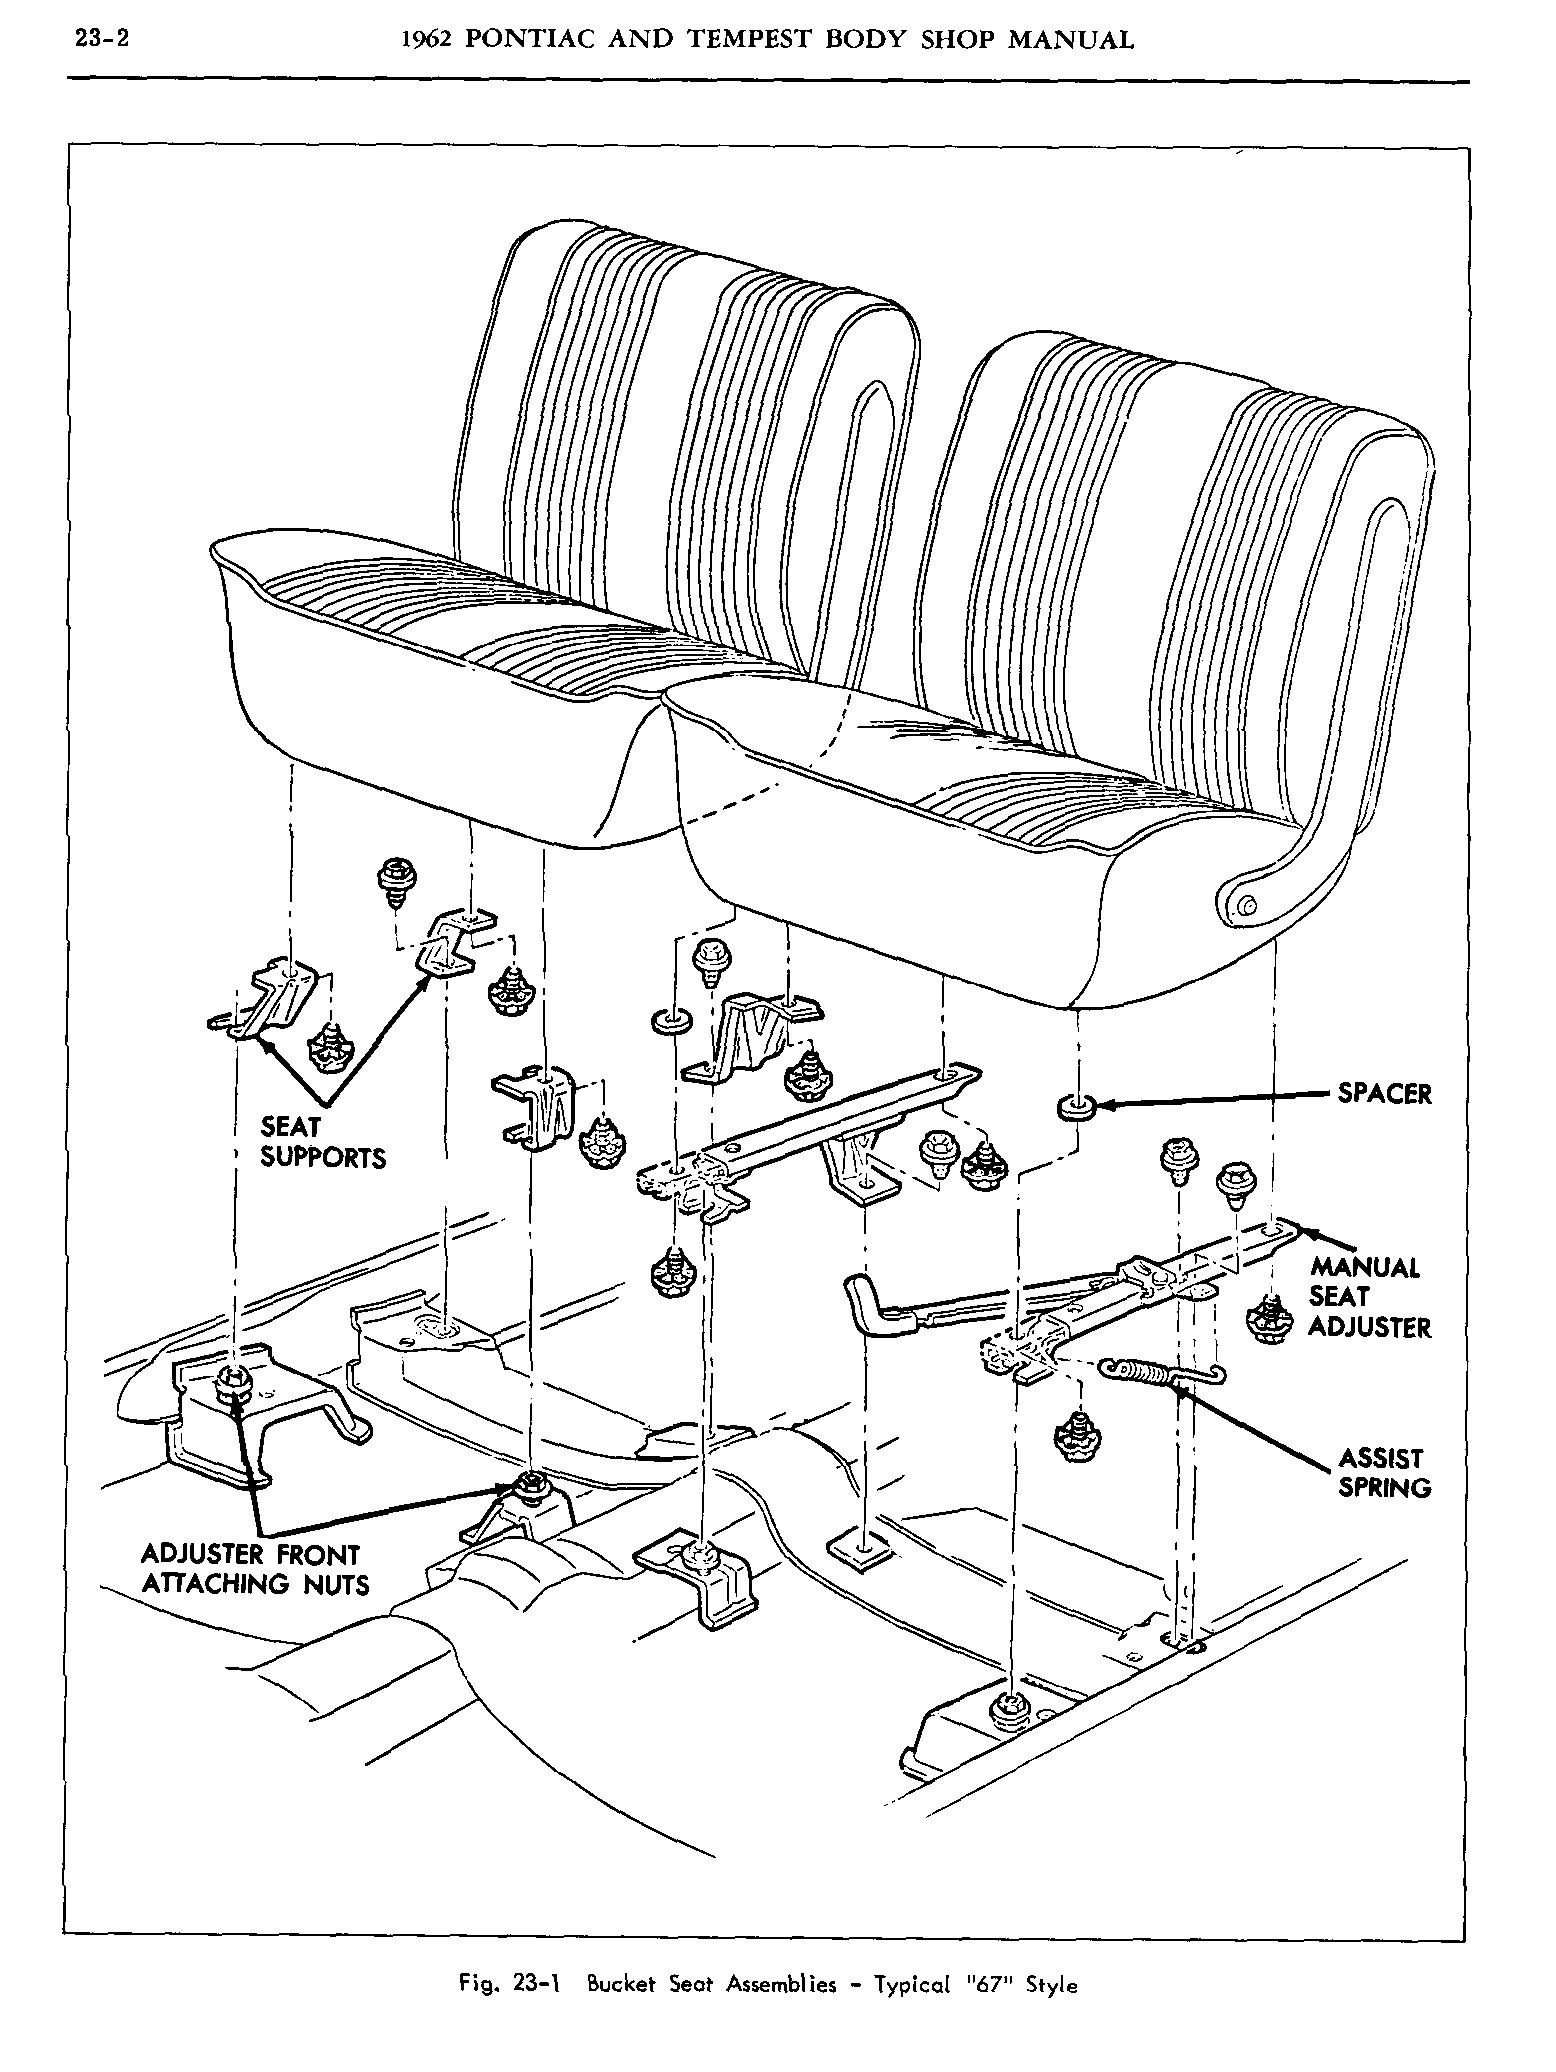 1962 Pontiac Shop Manual- Pontiac and Tempest Bucket Seats